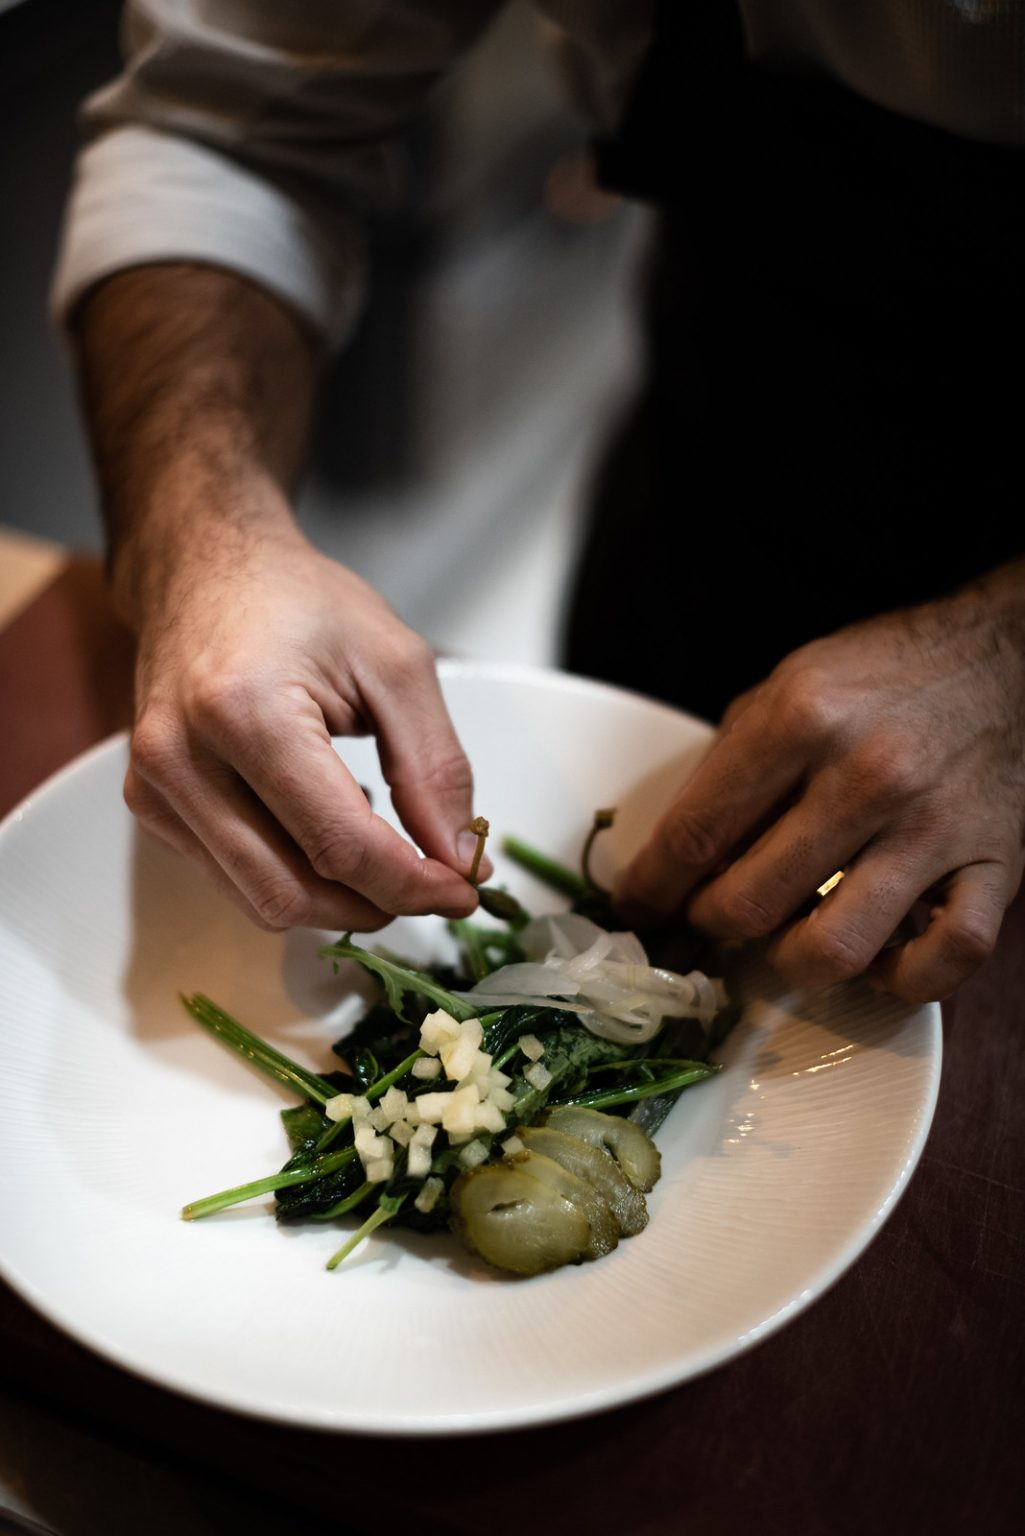 https://www.white-ibiza.com/wp-content/uploads/2020/11/cas-gasi-restaurant-2020-10-1025x1536.jpg